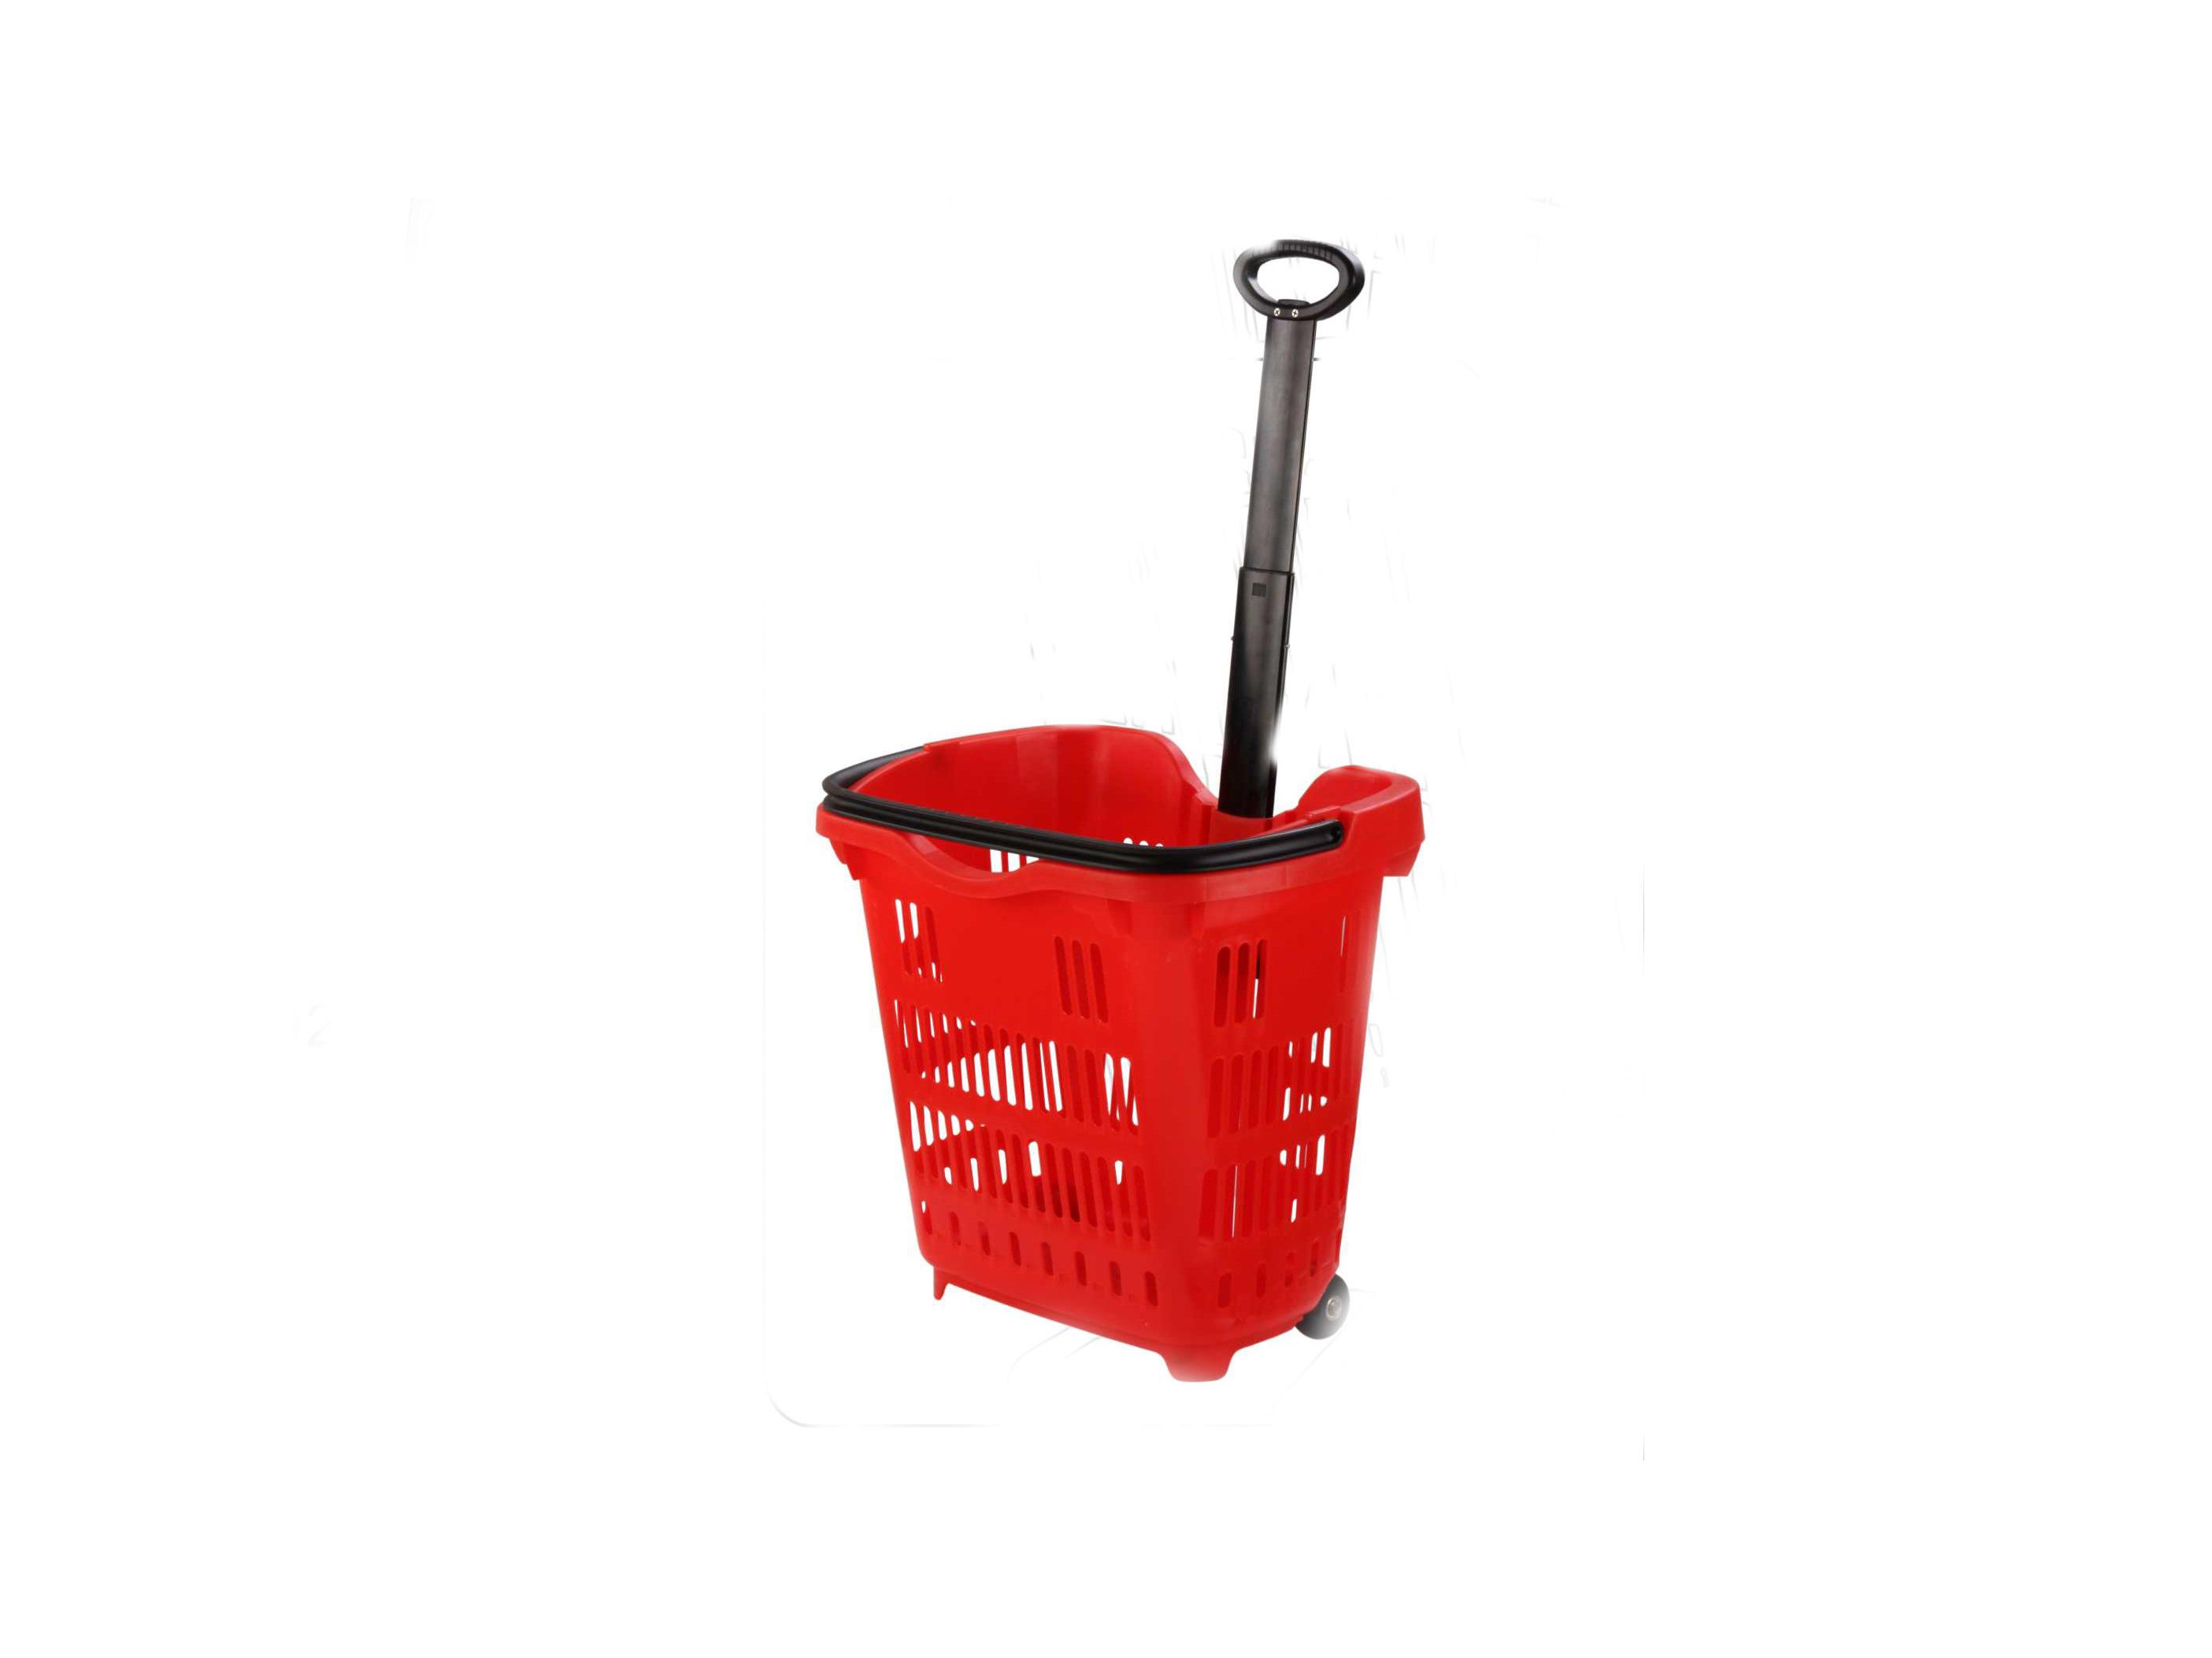 pw603 塑料购物篮